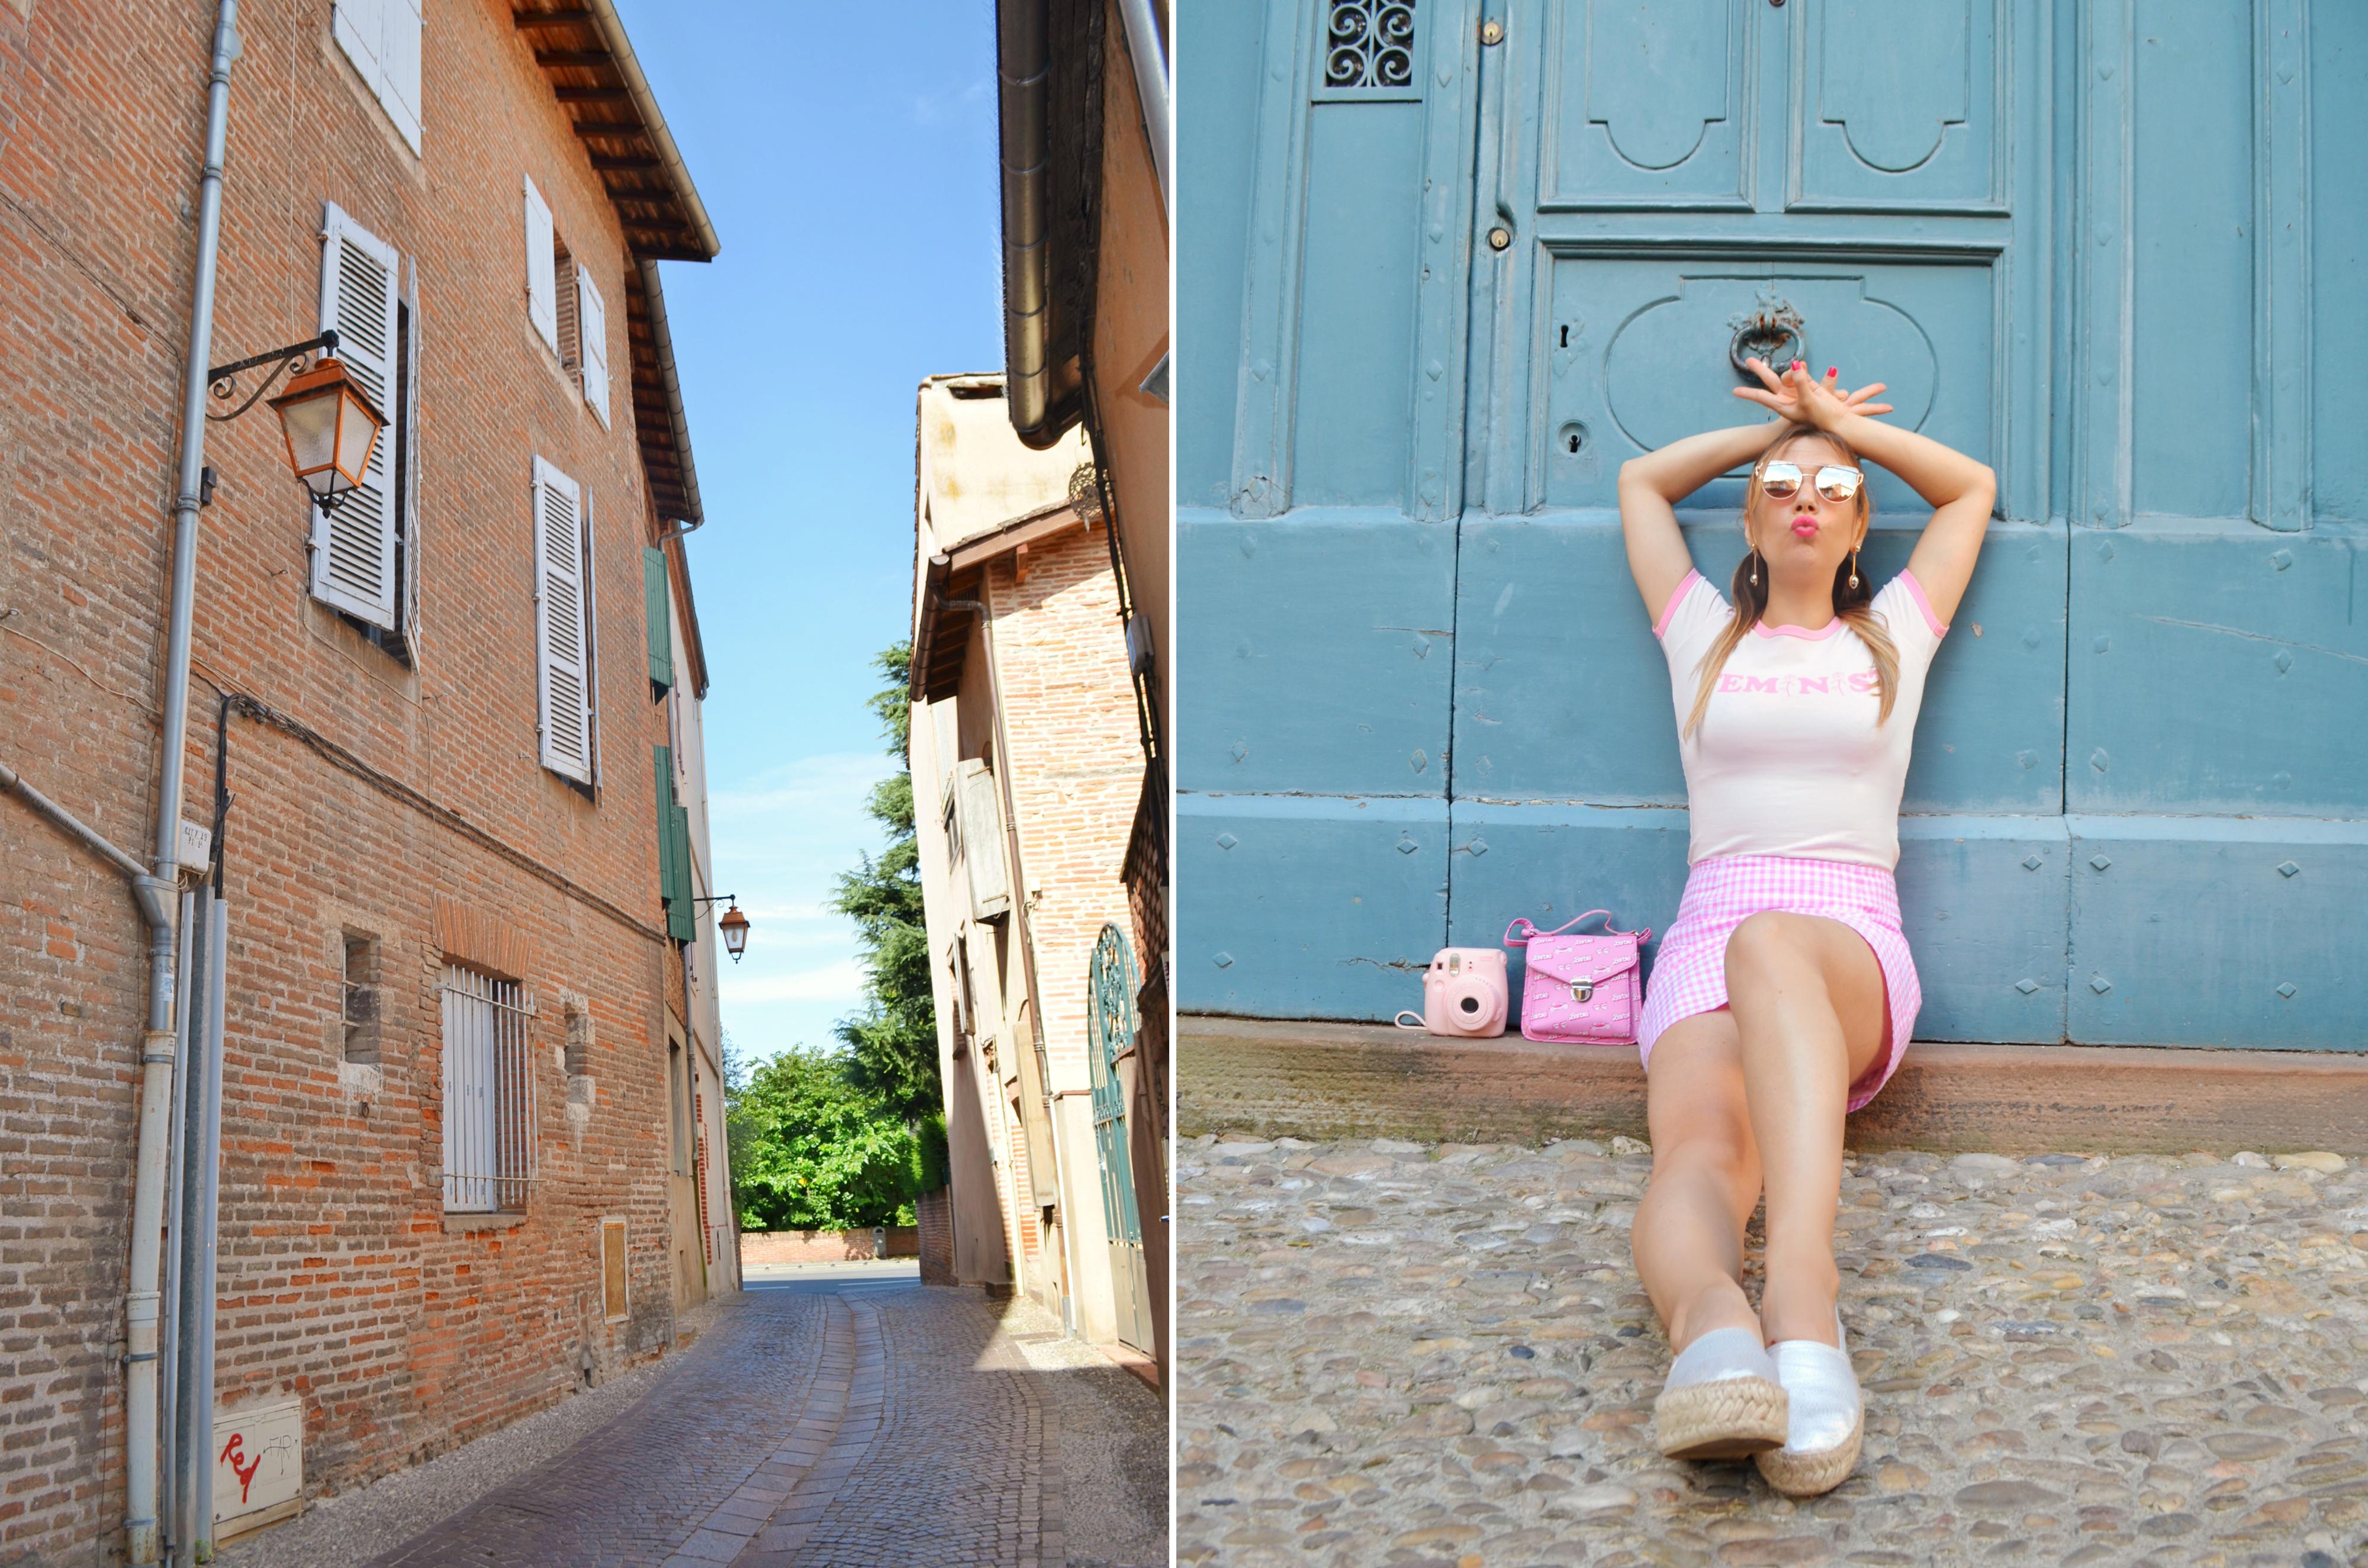 Fashion-traveler-ChicAdicta-Albi-Francia-Chic-Adicta-influencer-vichy-look-pink-fancy-fujifilm-gafas-primark-PiensaenChic-Piensa-en-Chic